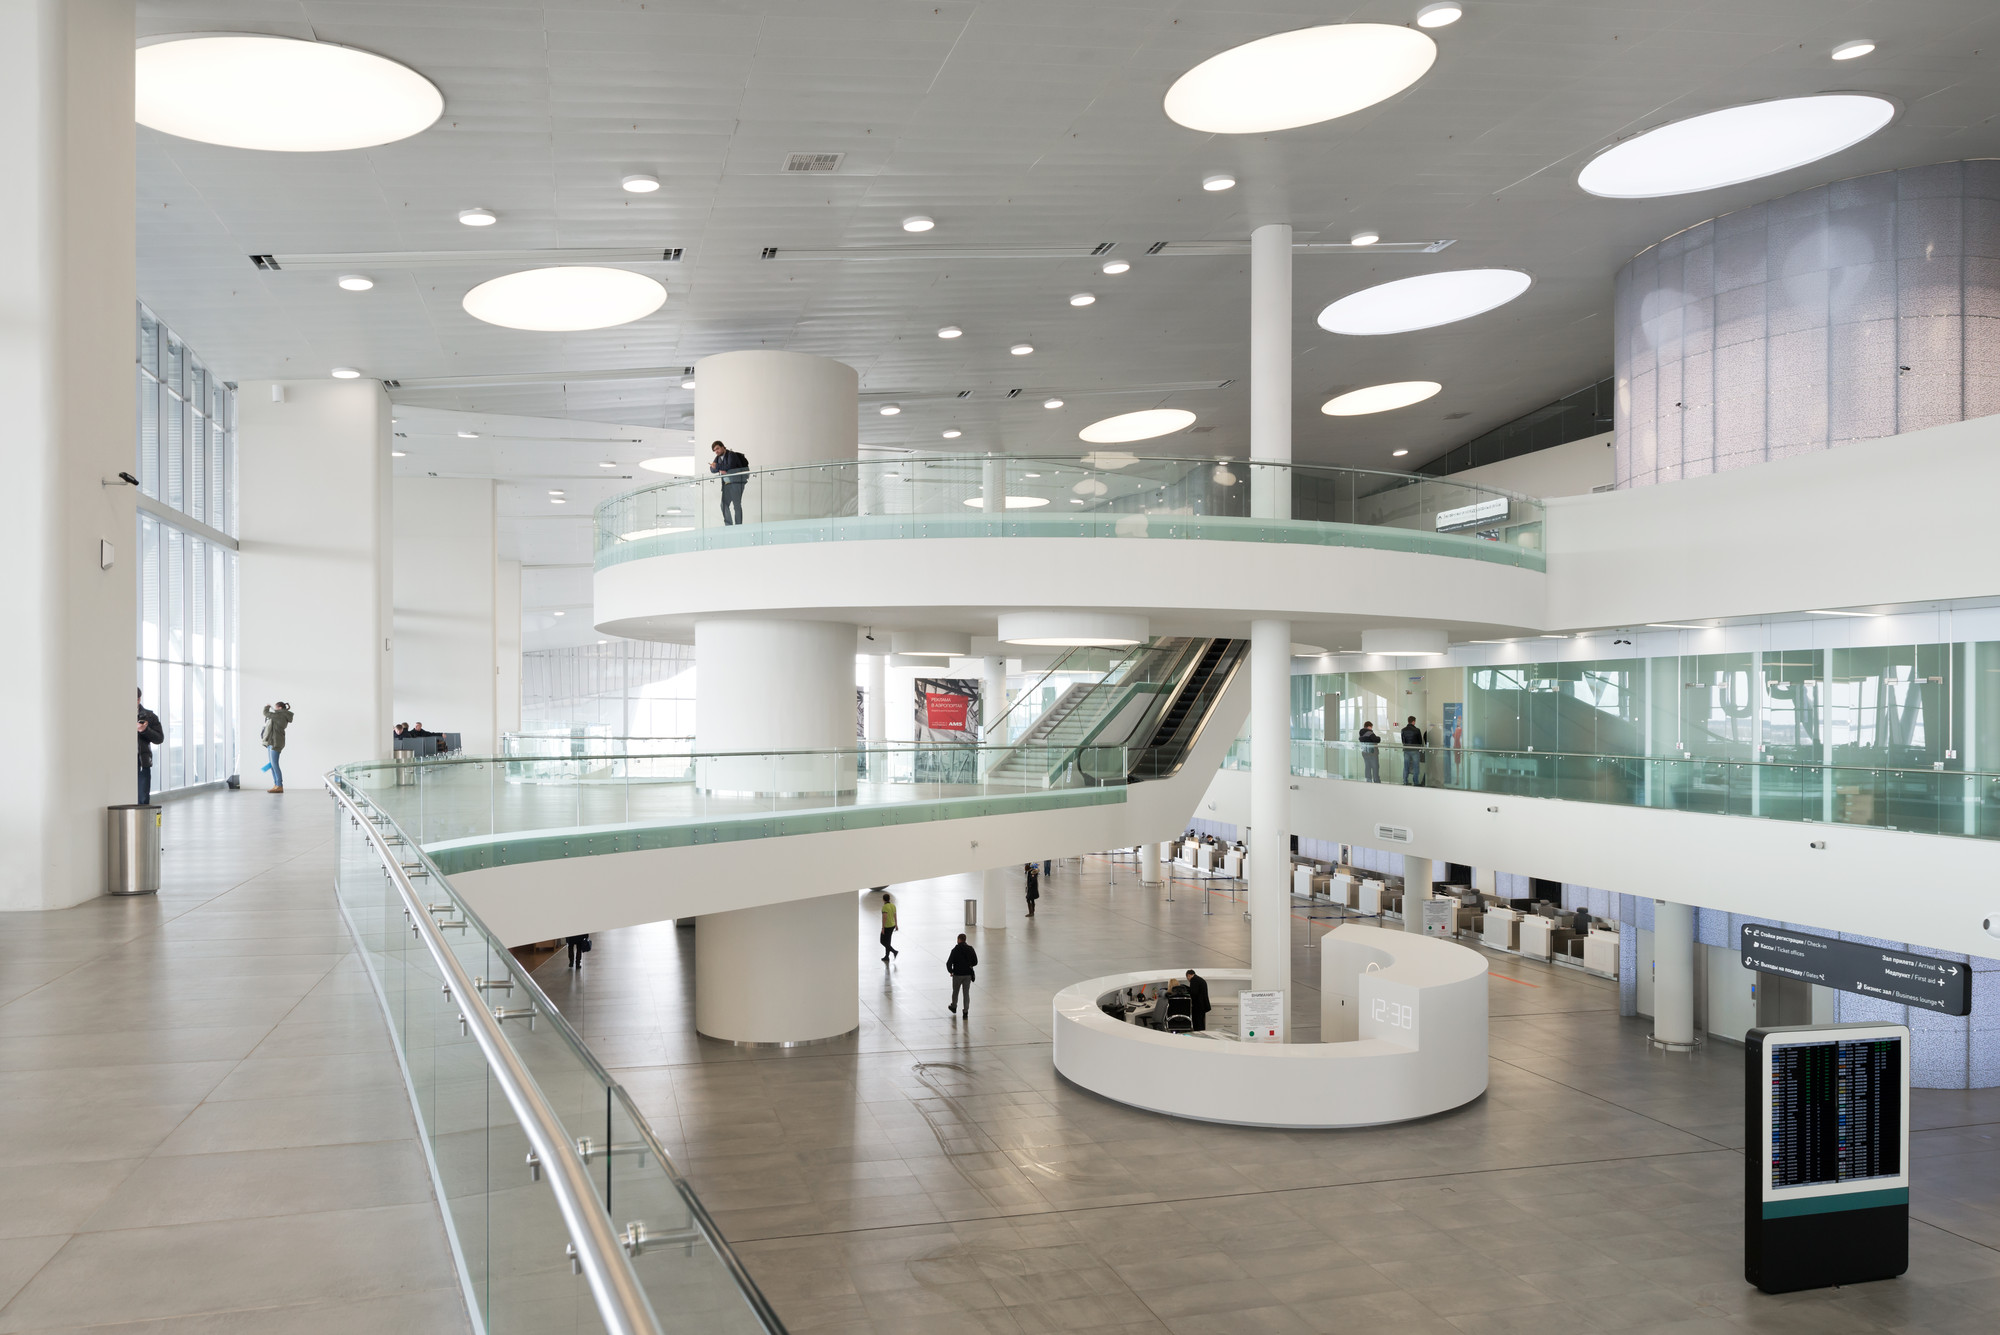 Kurumoch International Airport and VIP-Lounges / Nefa Architects, © Ilya Ivanov